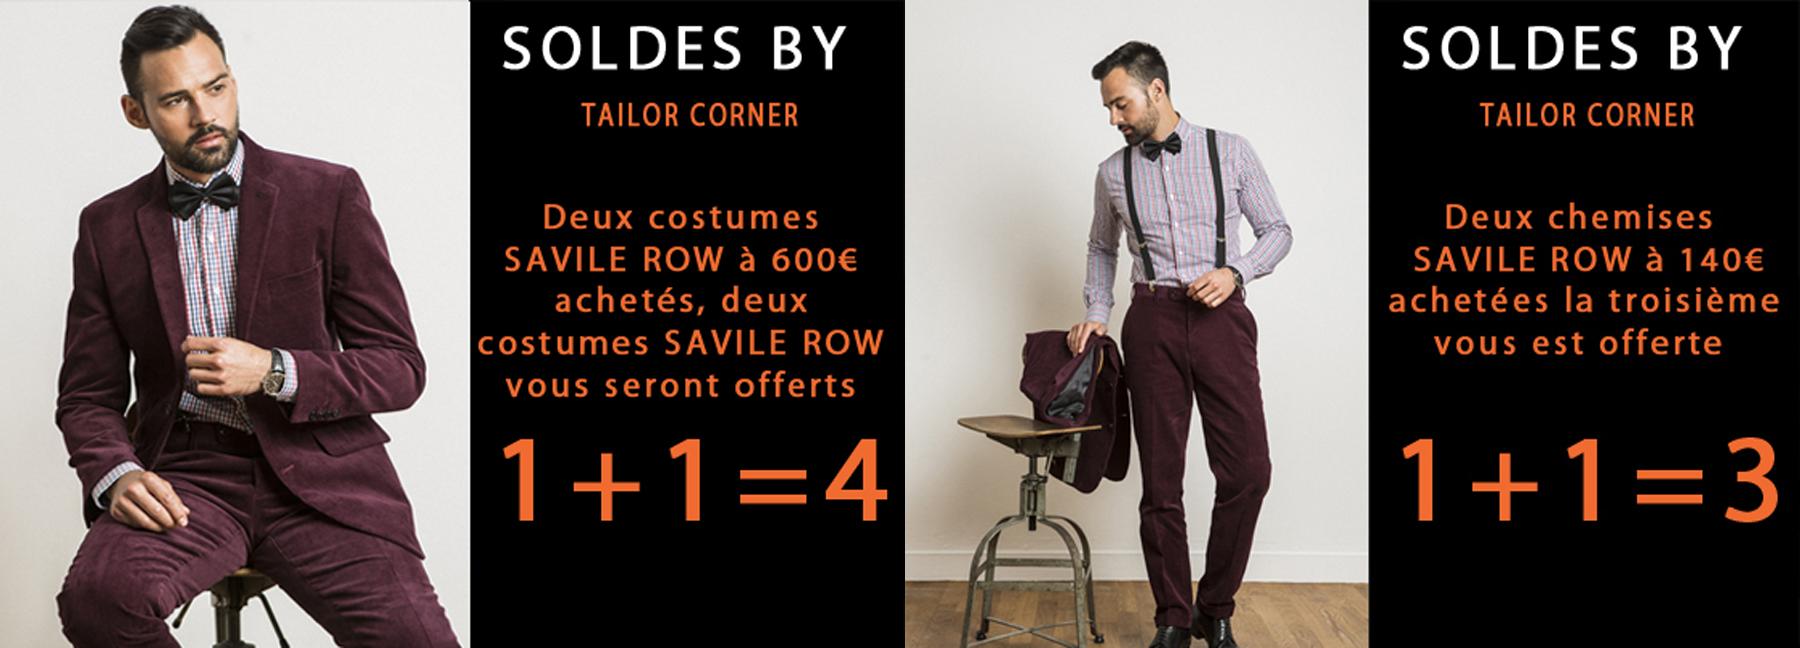 chemise sur mesure Tailor Corner